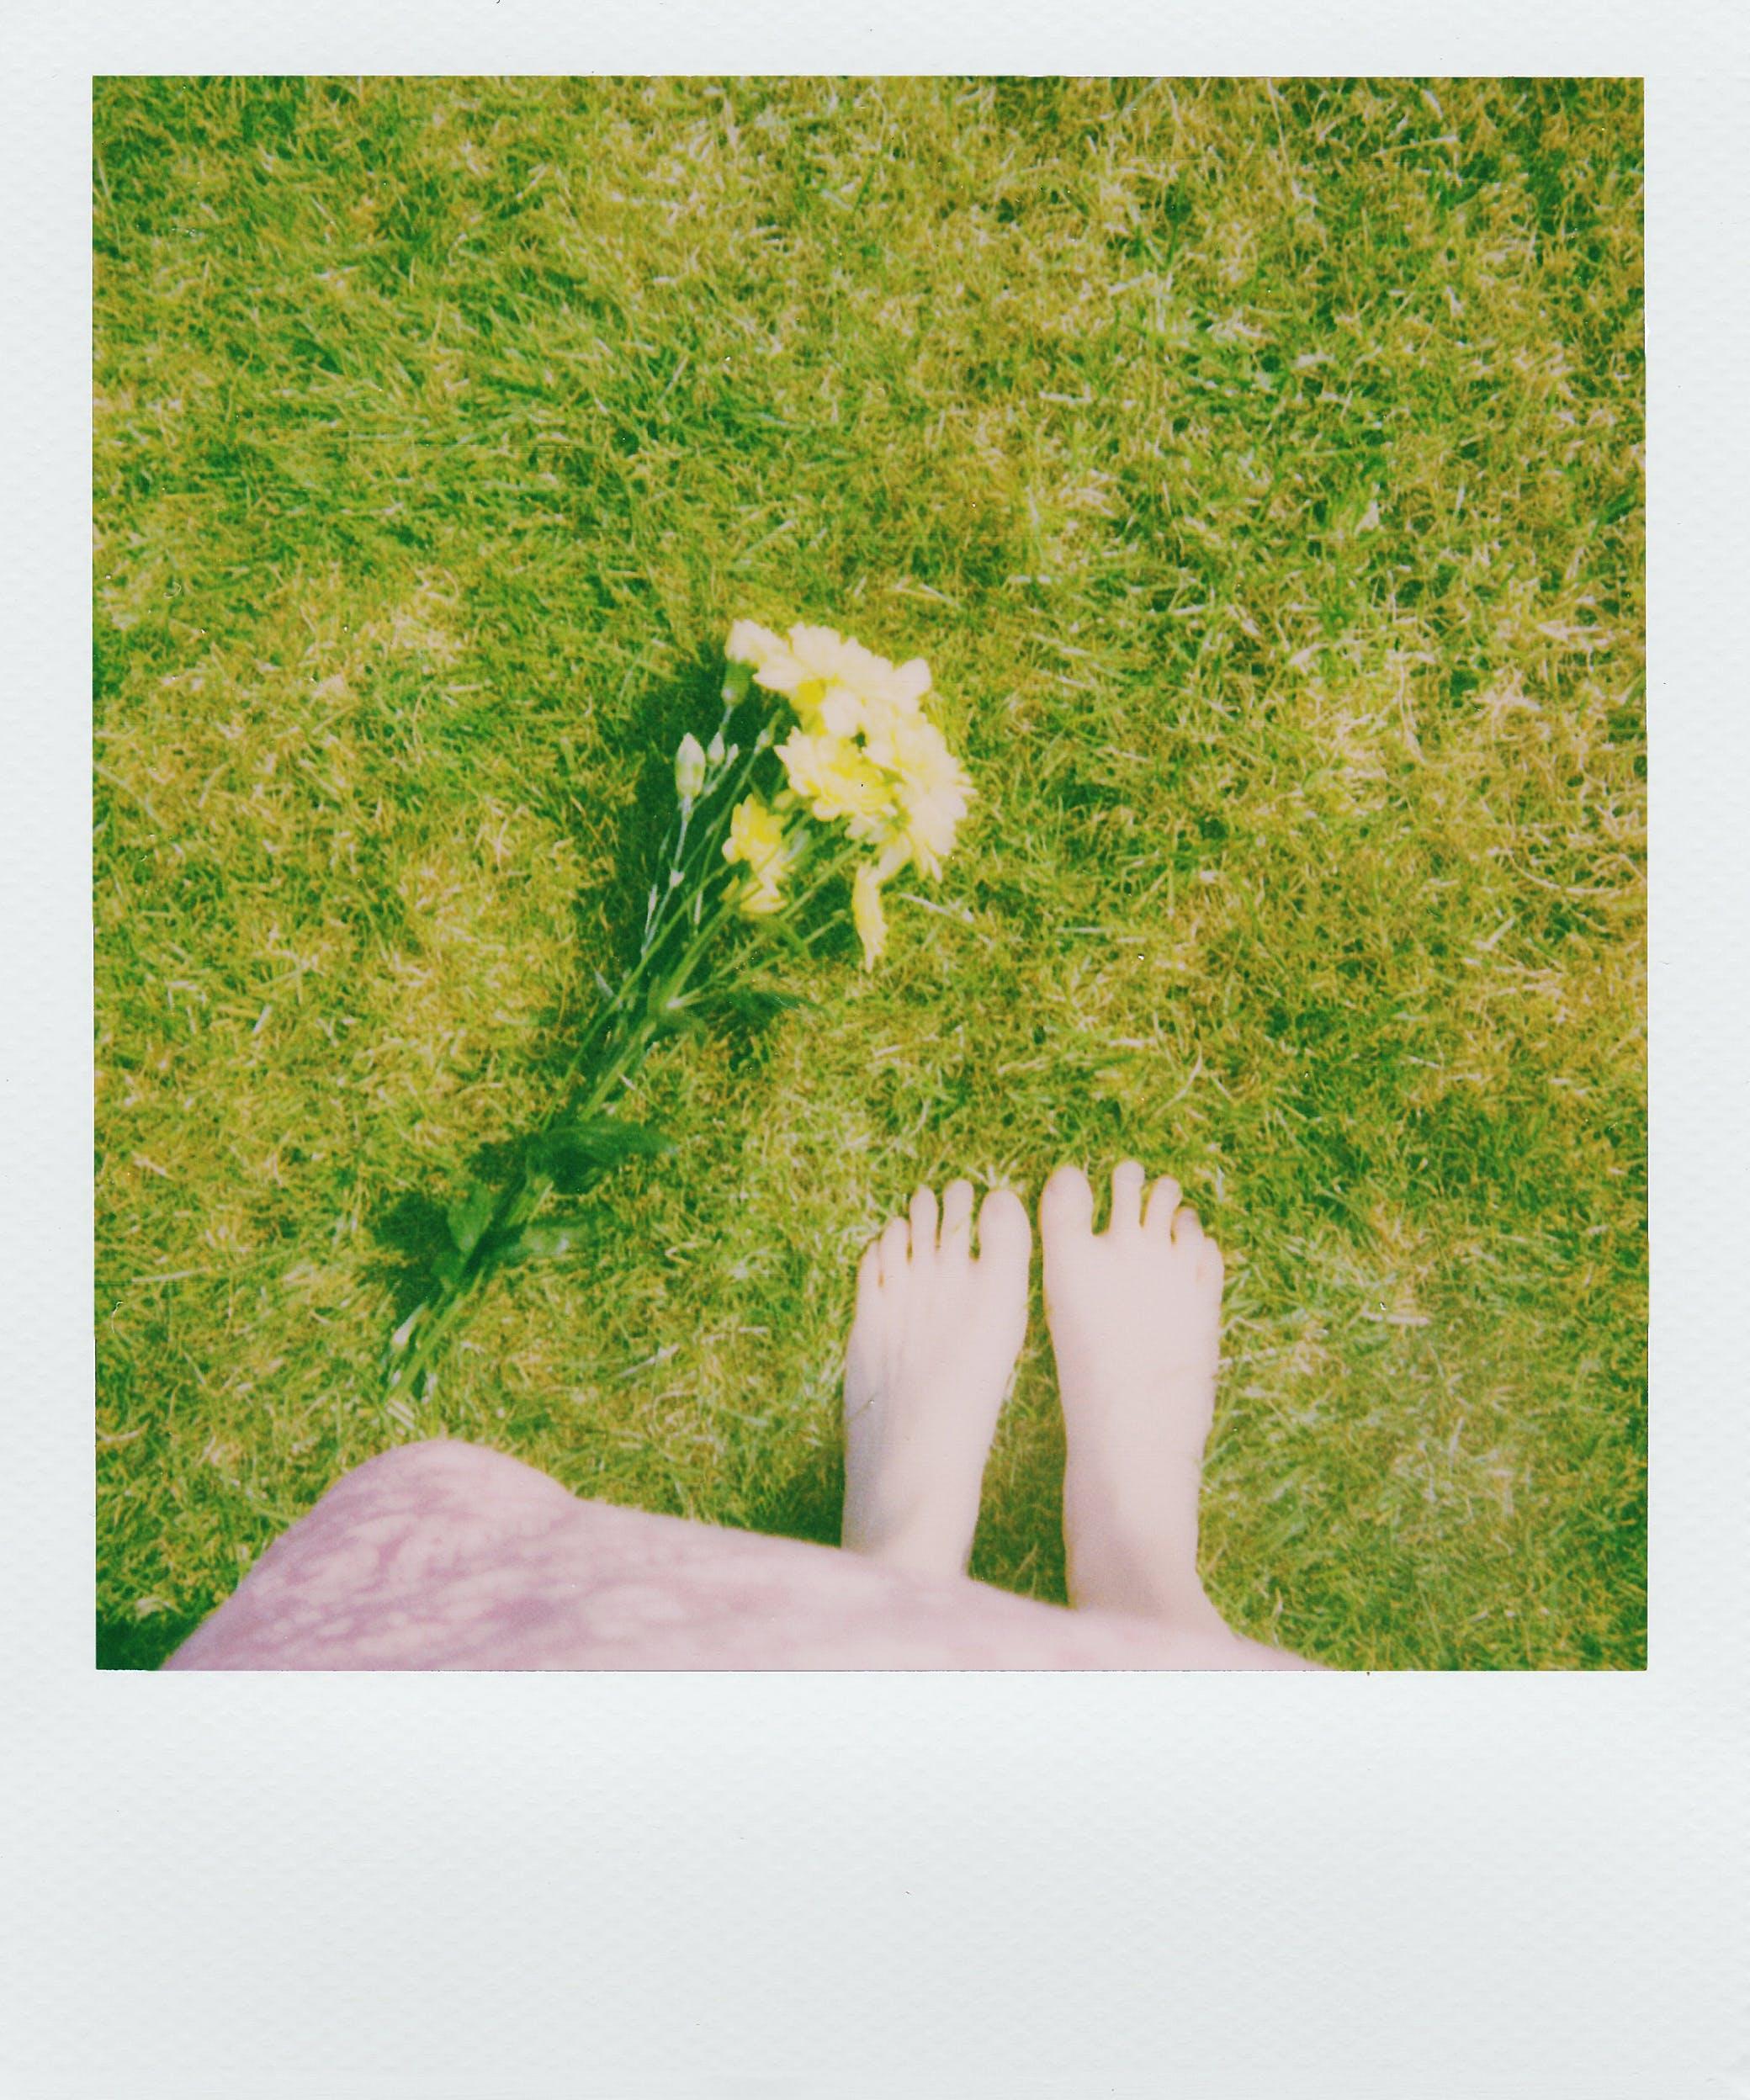 Person Standing on Grass Beside Petaled Flower